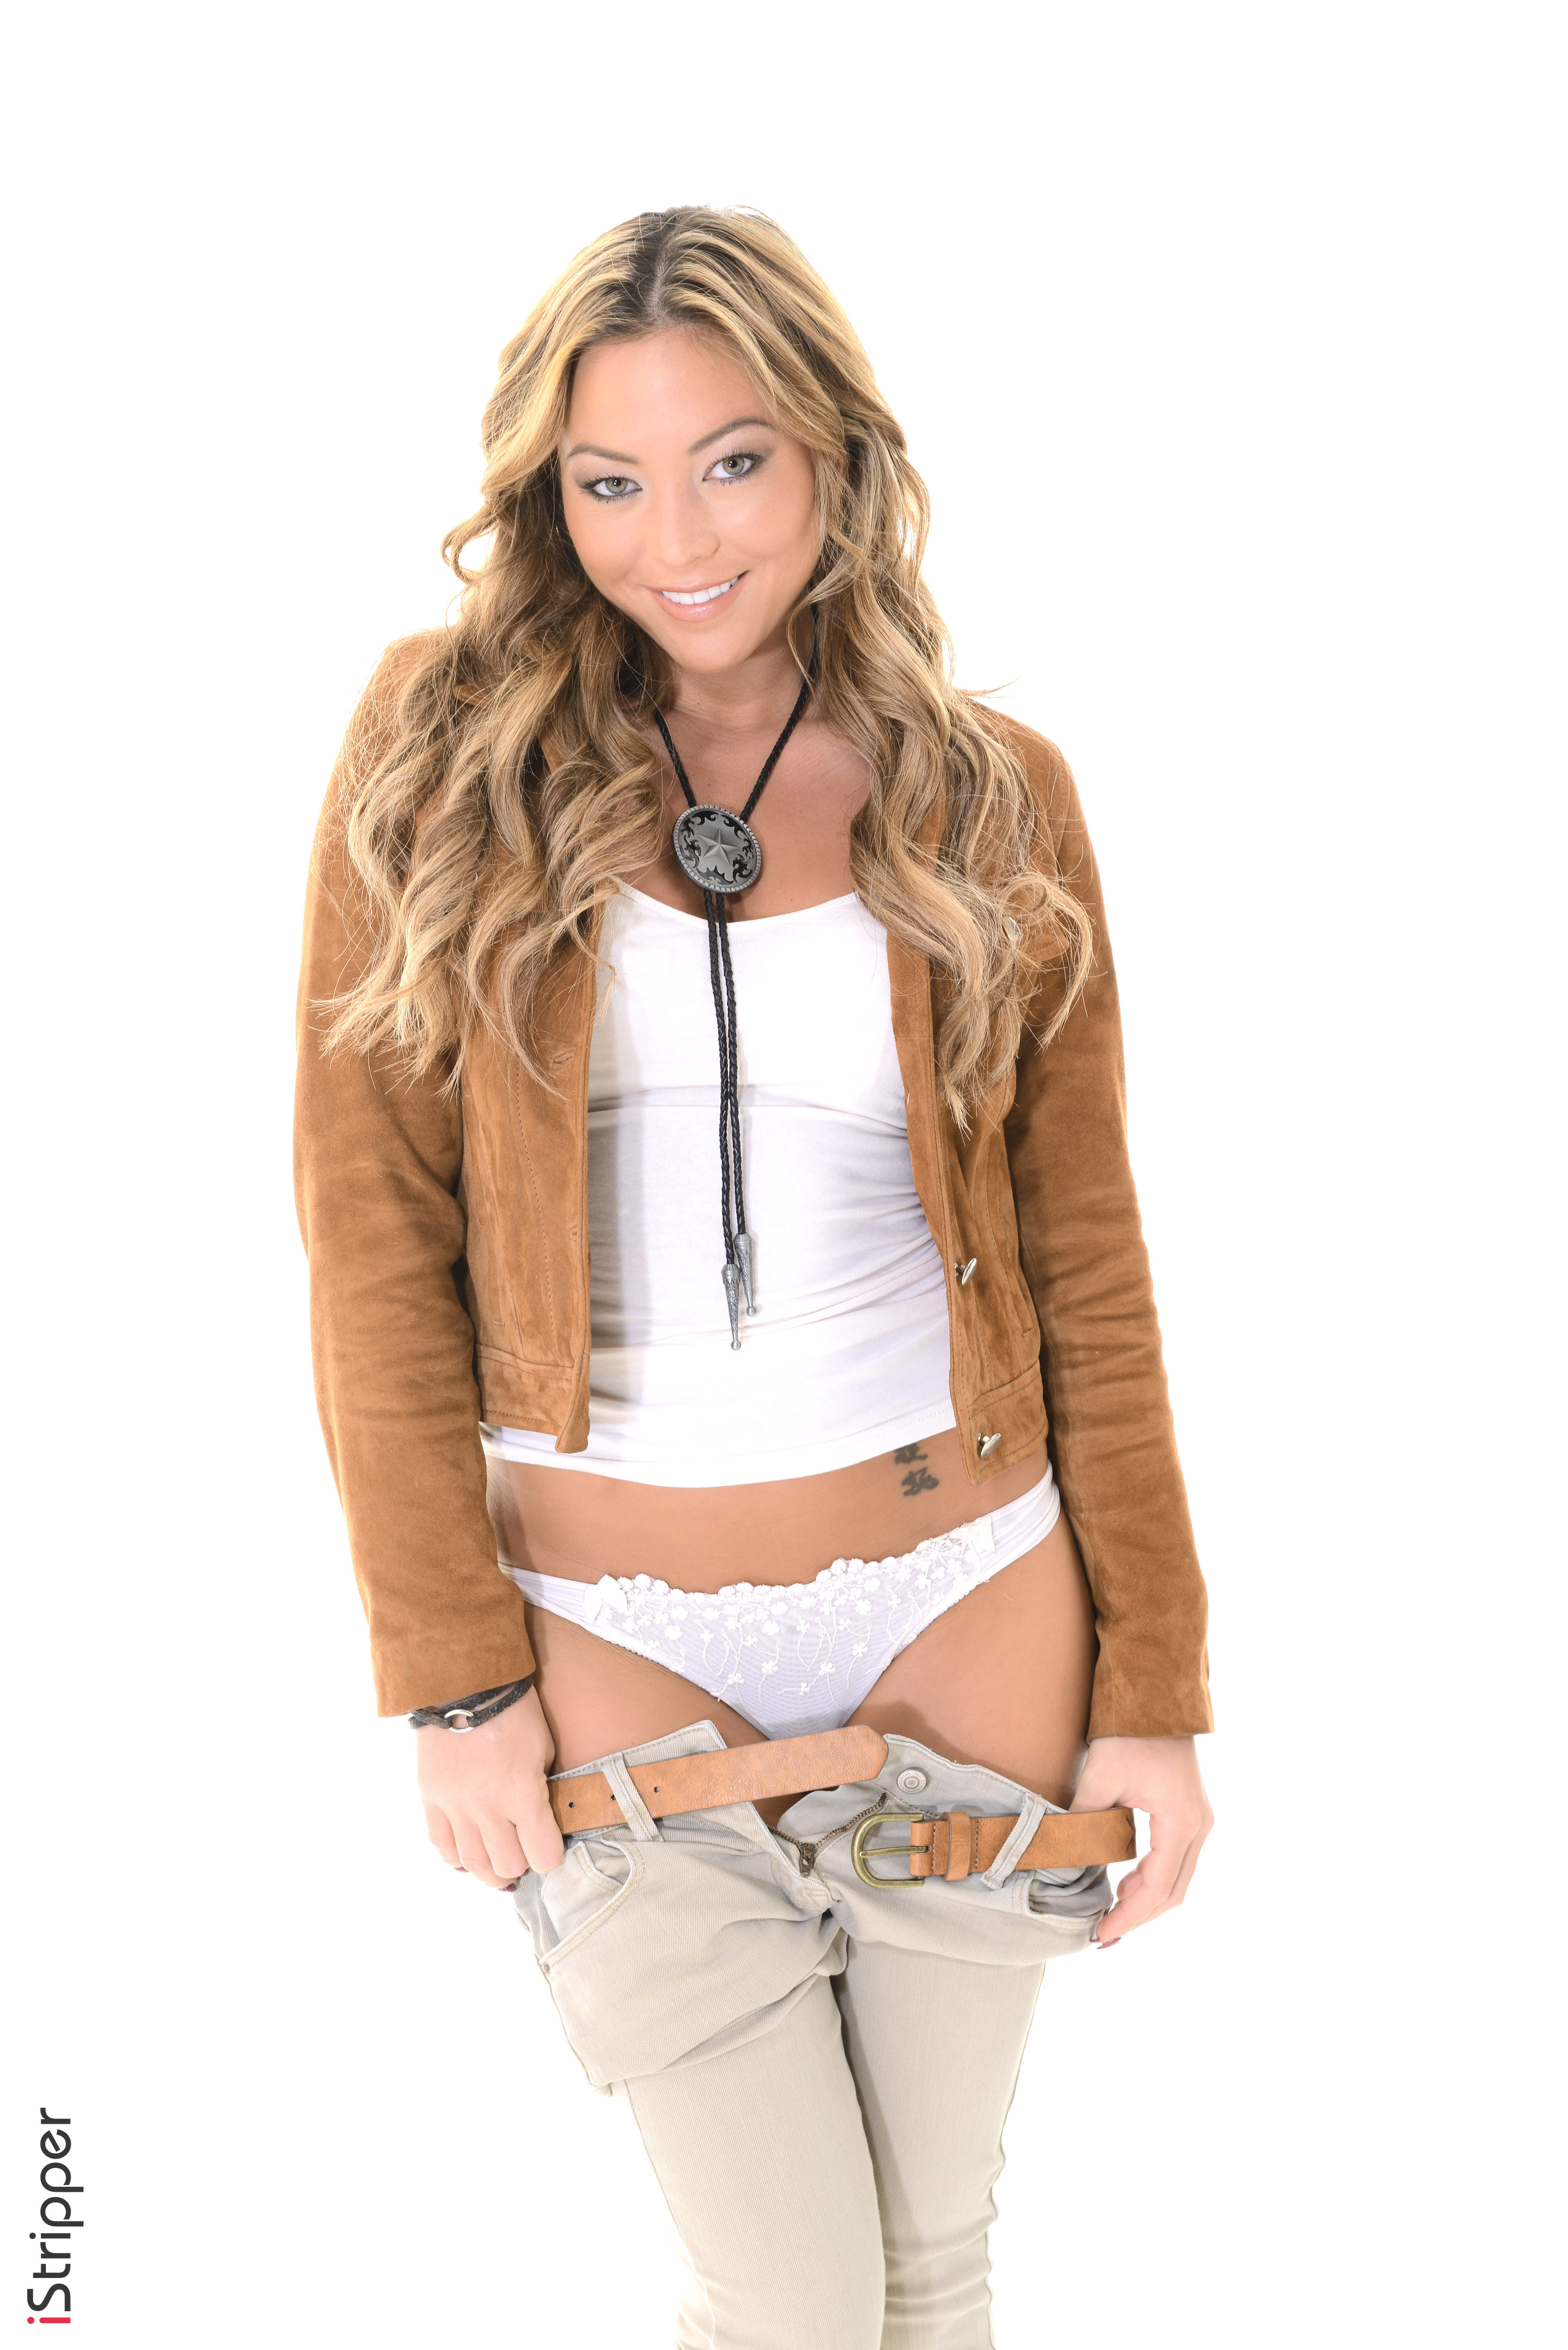 arissa does a sexy striptease amp cums hard localfreaks tumblr co